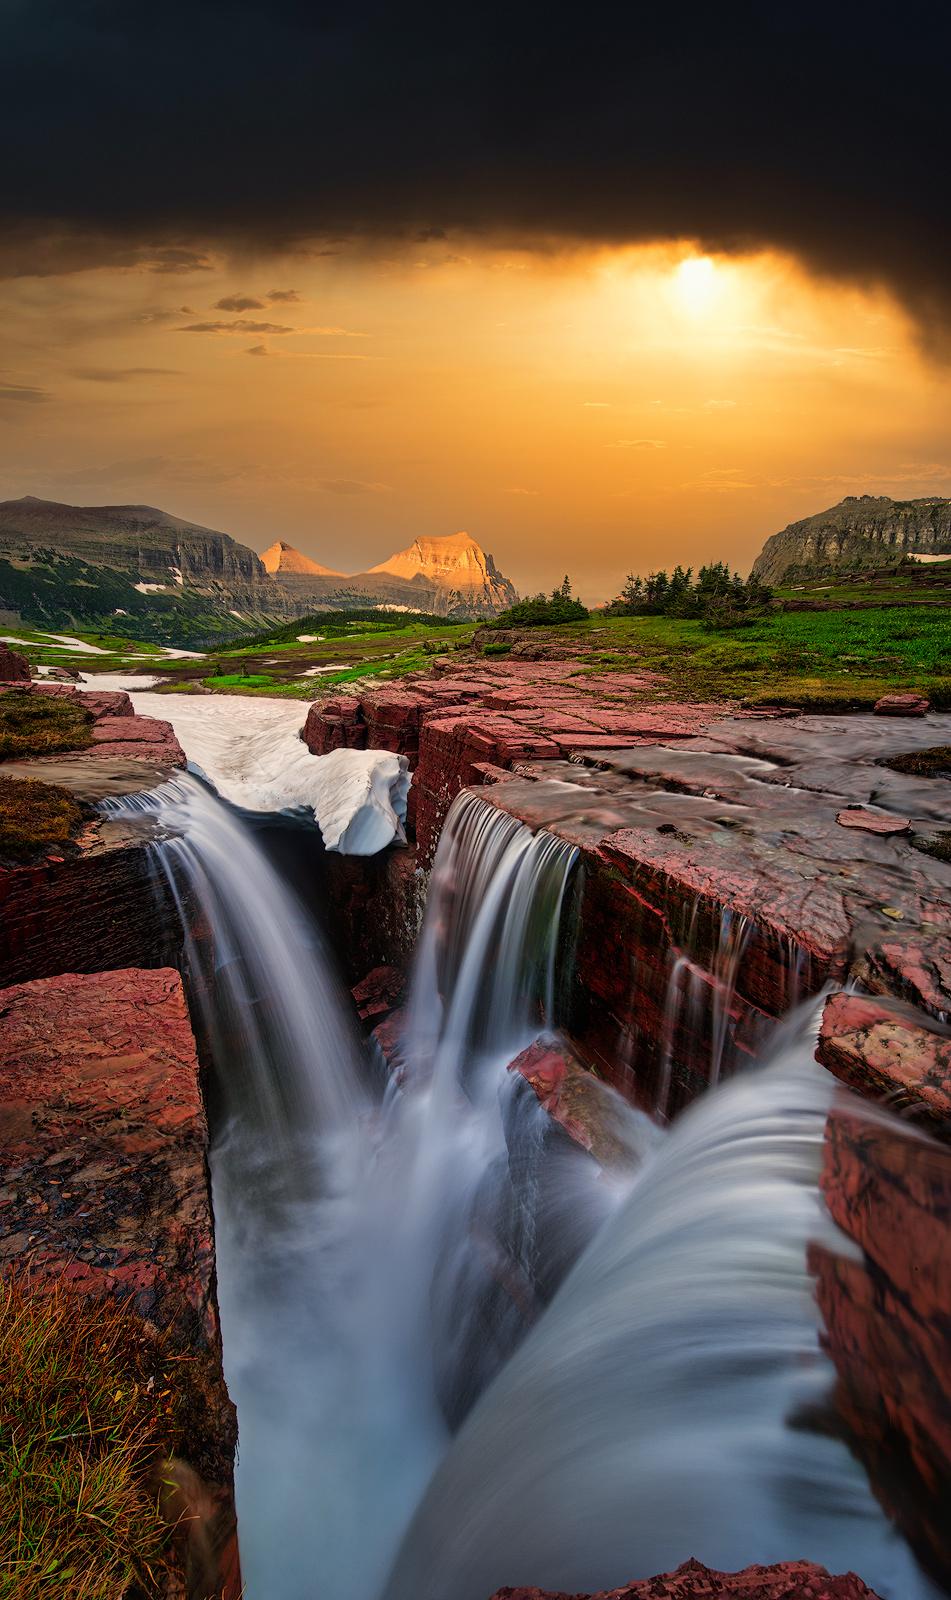 Glacier National Park, Montana, Bernard Chen, Horizontal, Outdoors, Day, Nature, Tranquility, Scenics, Tranquil Scene, Beauty...